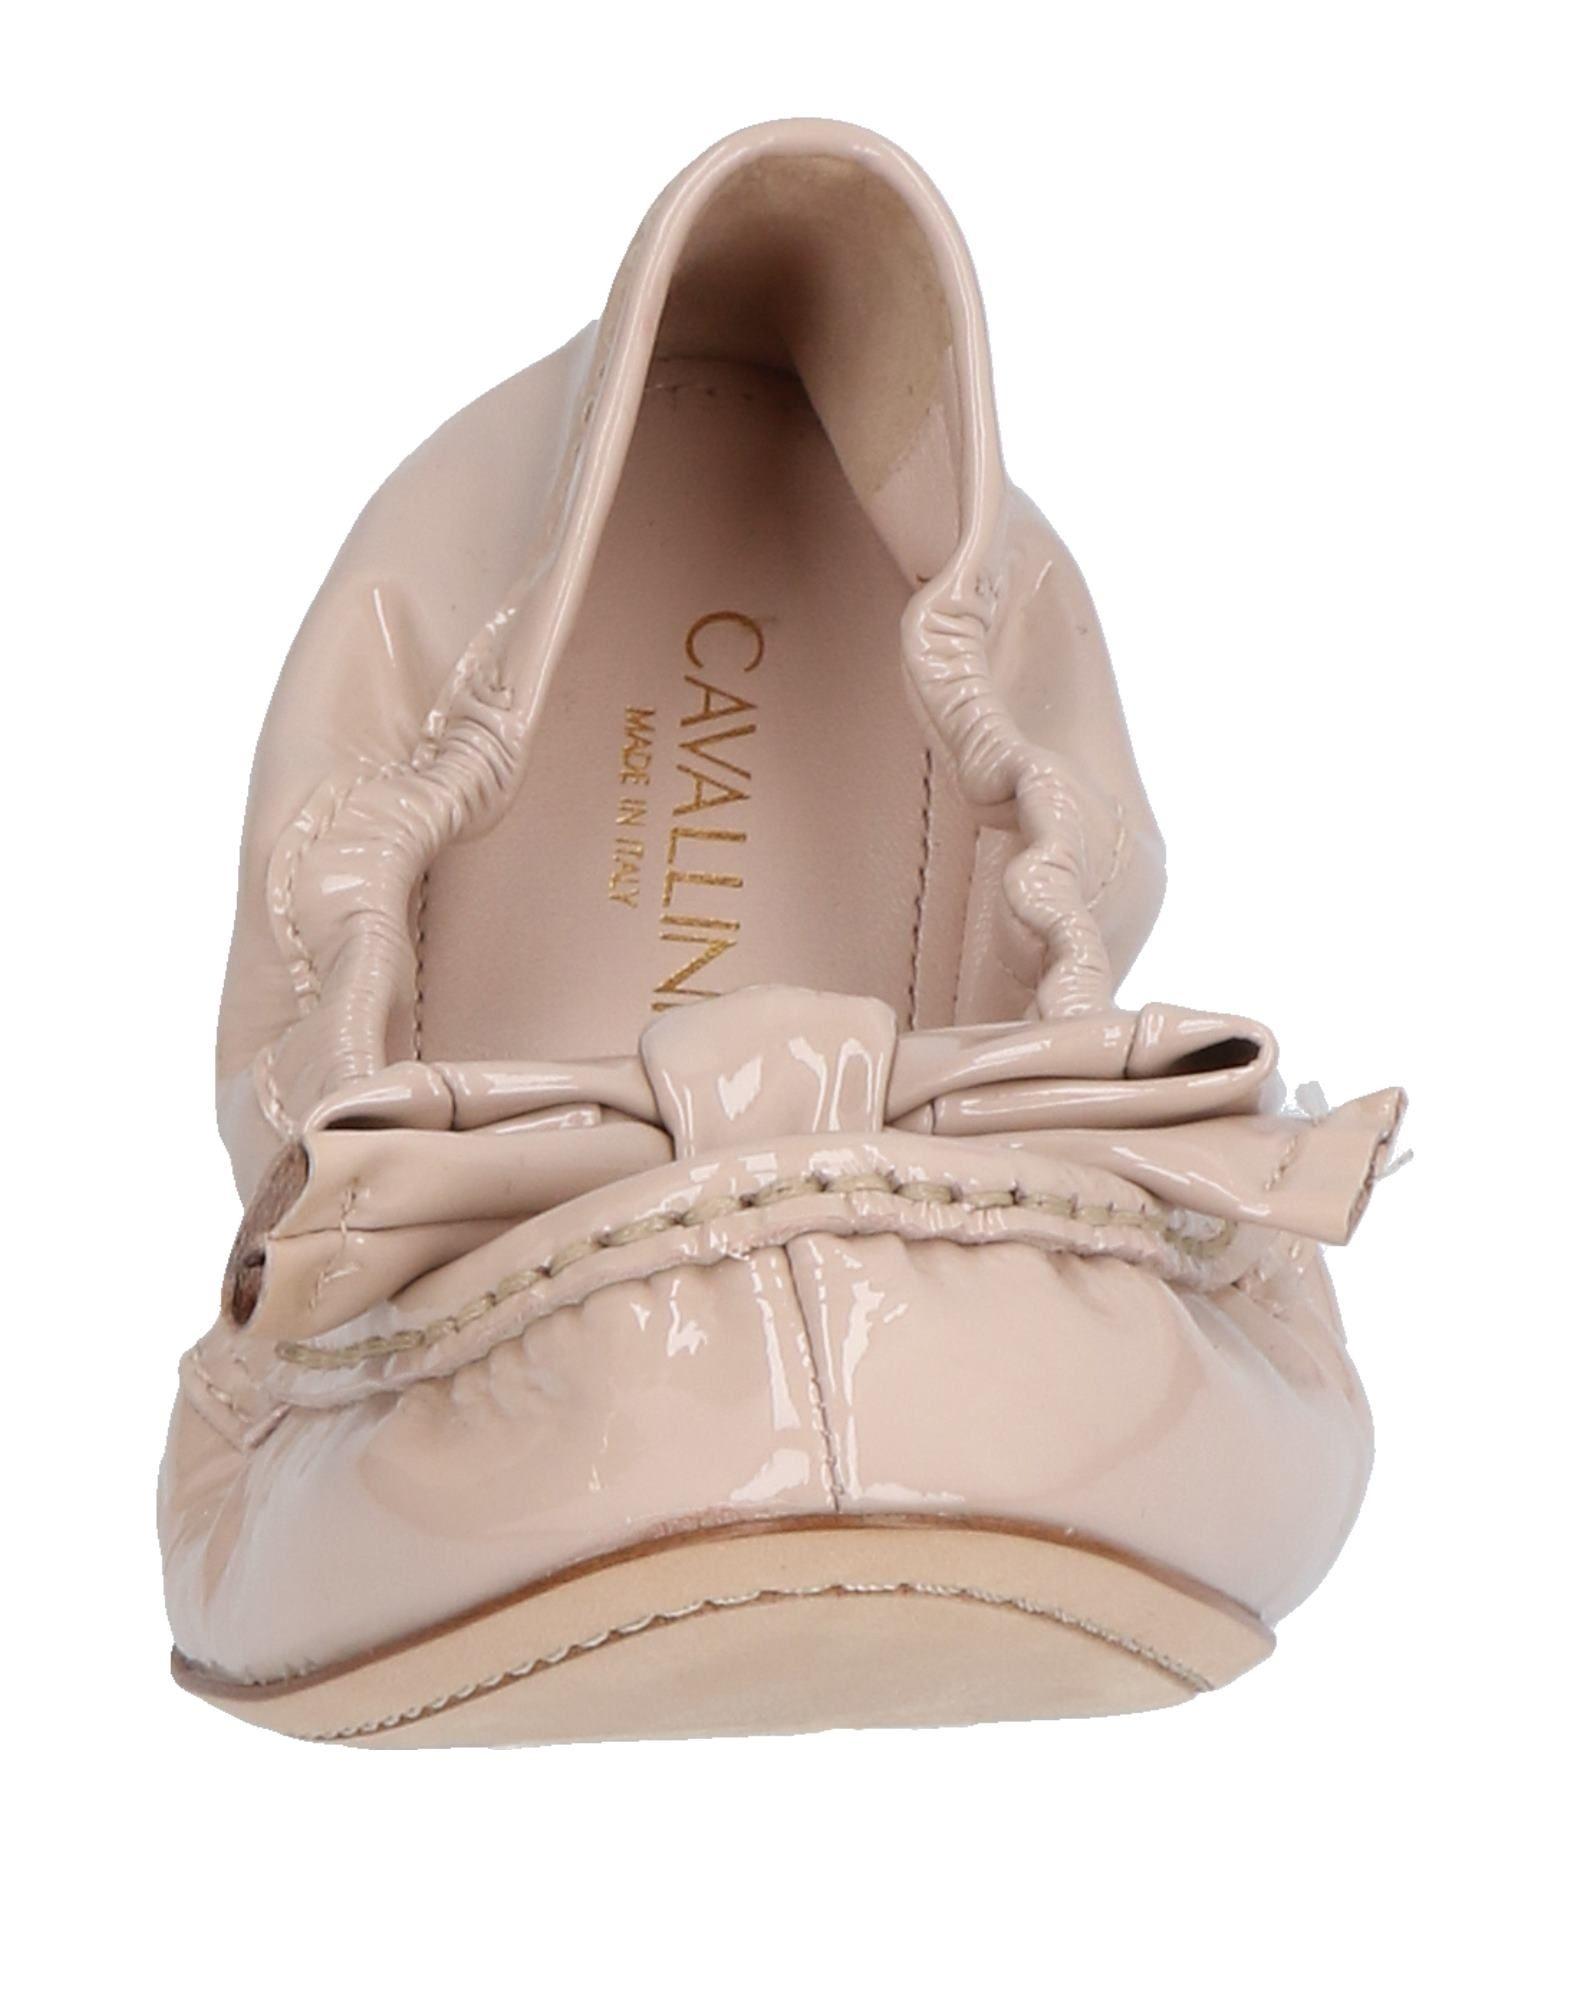 Stilvolle Cavallini billige Schuhe Cavallini Stilvolle Mokassins Damen  11484244RG 98b846